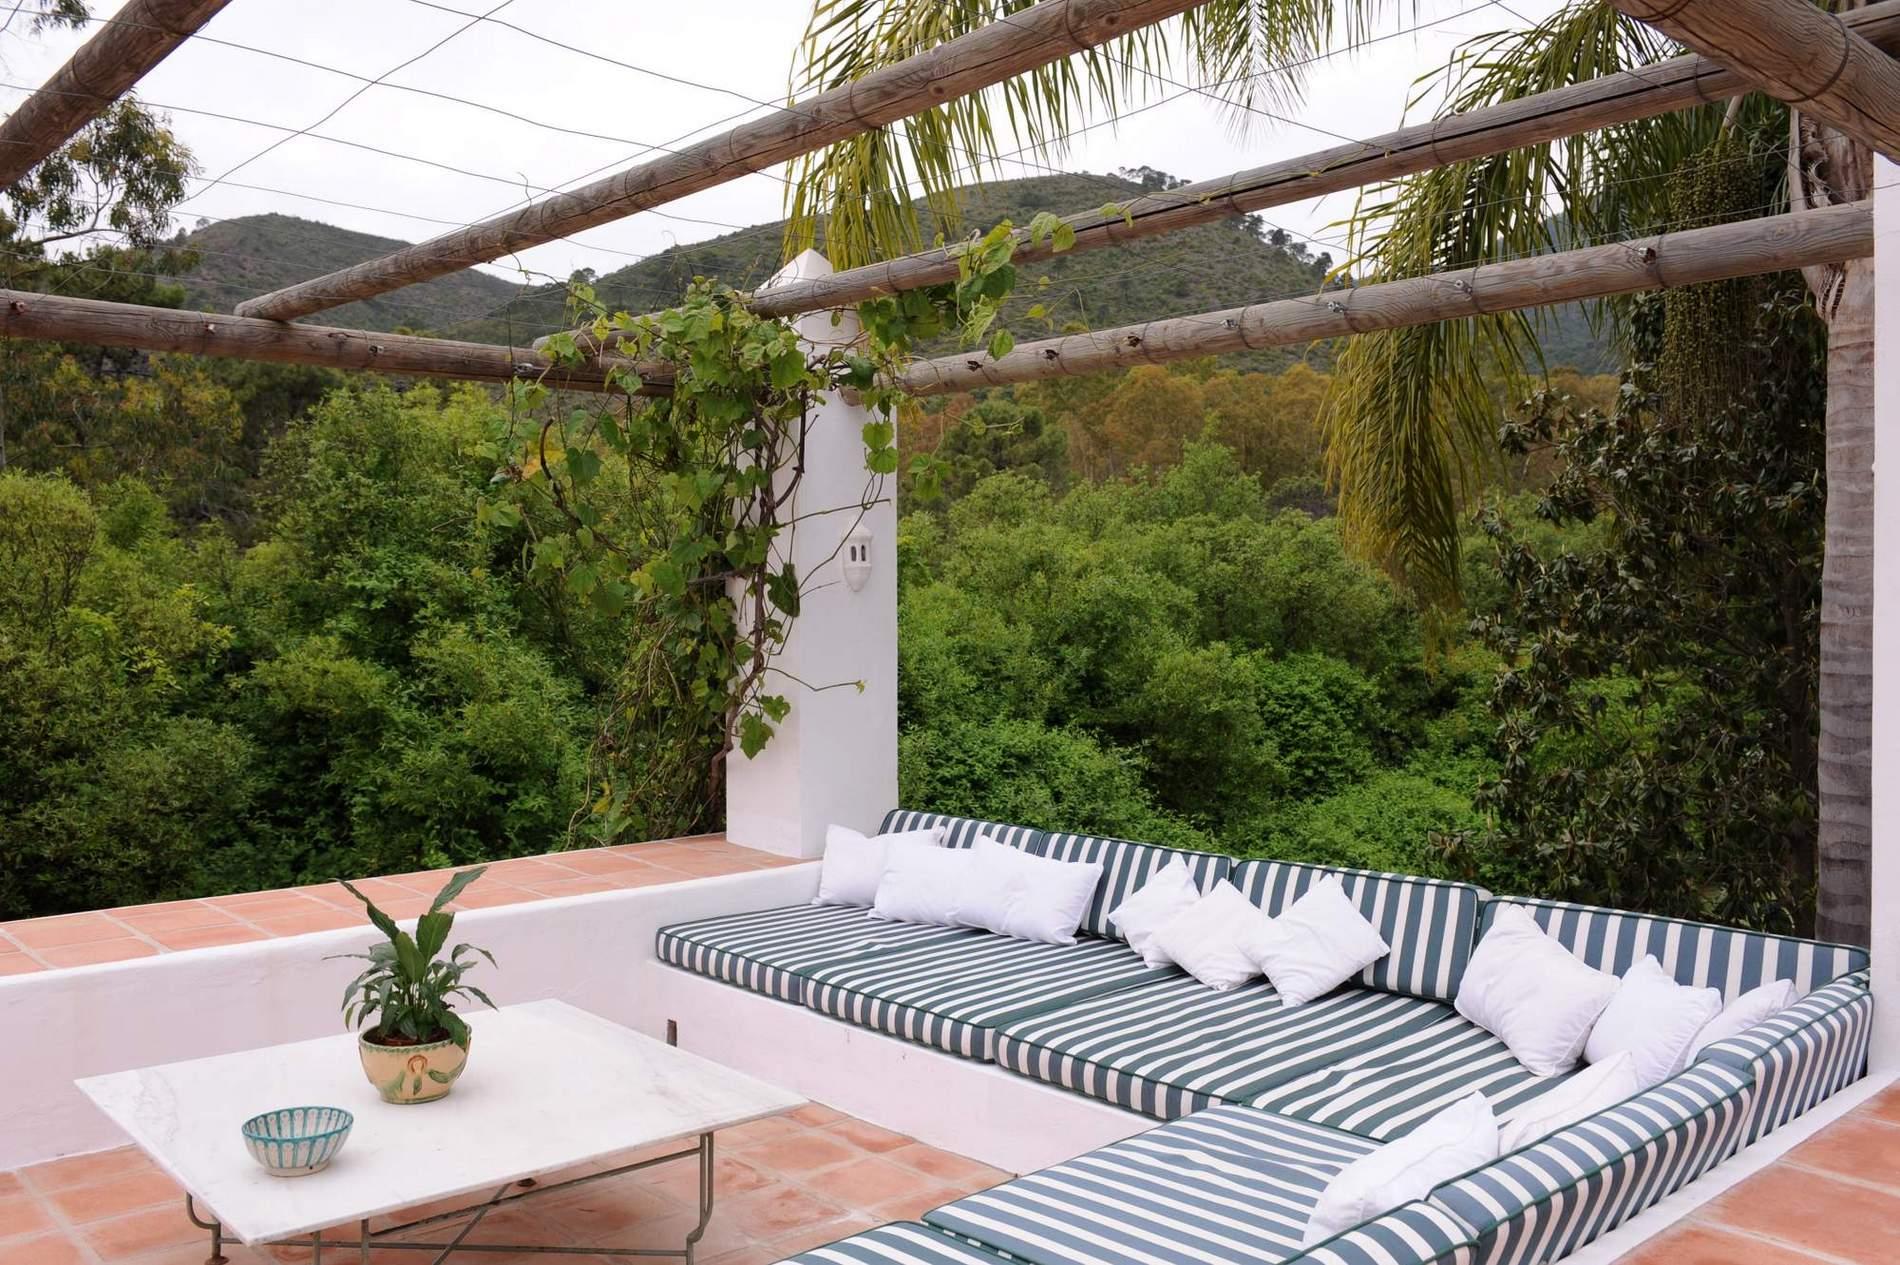 Casa-del-Rio-Roof-Terrace.jpg